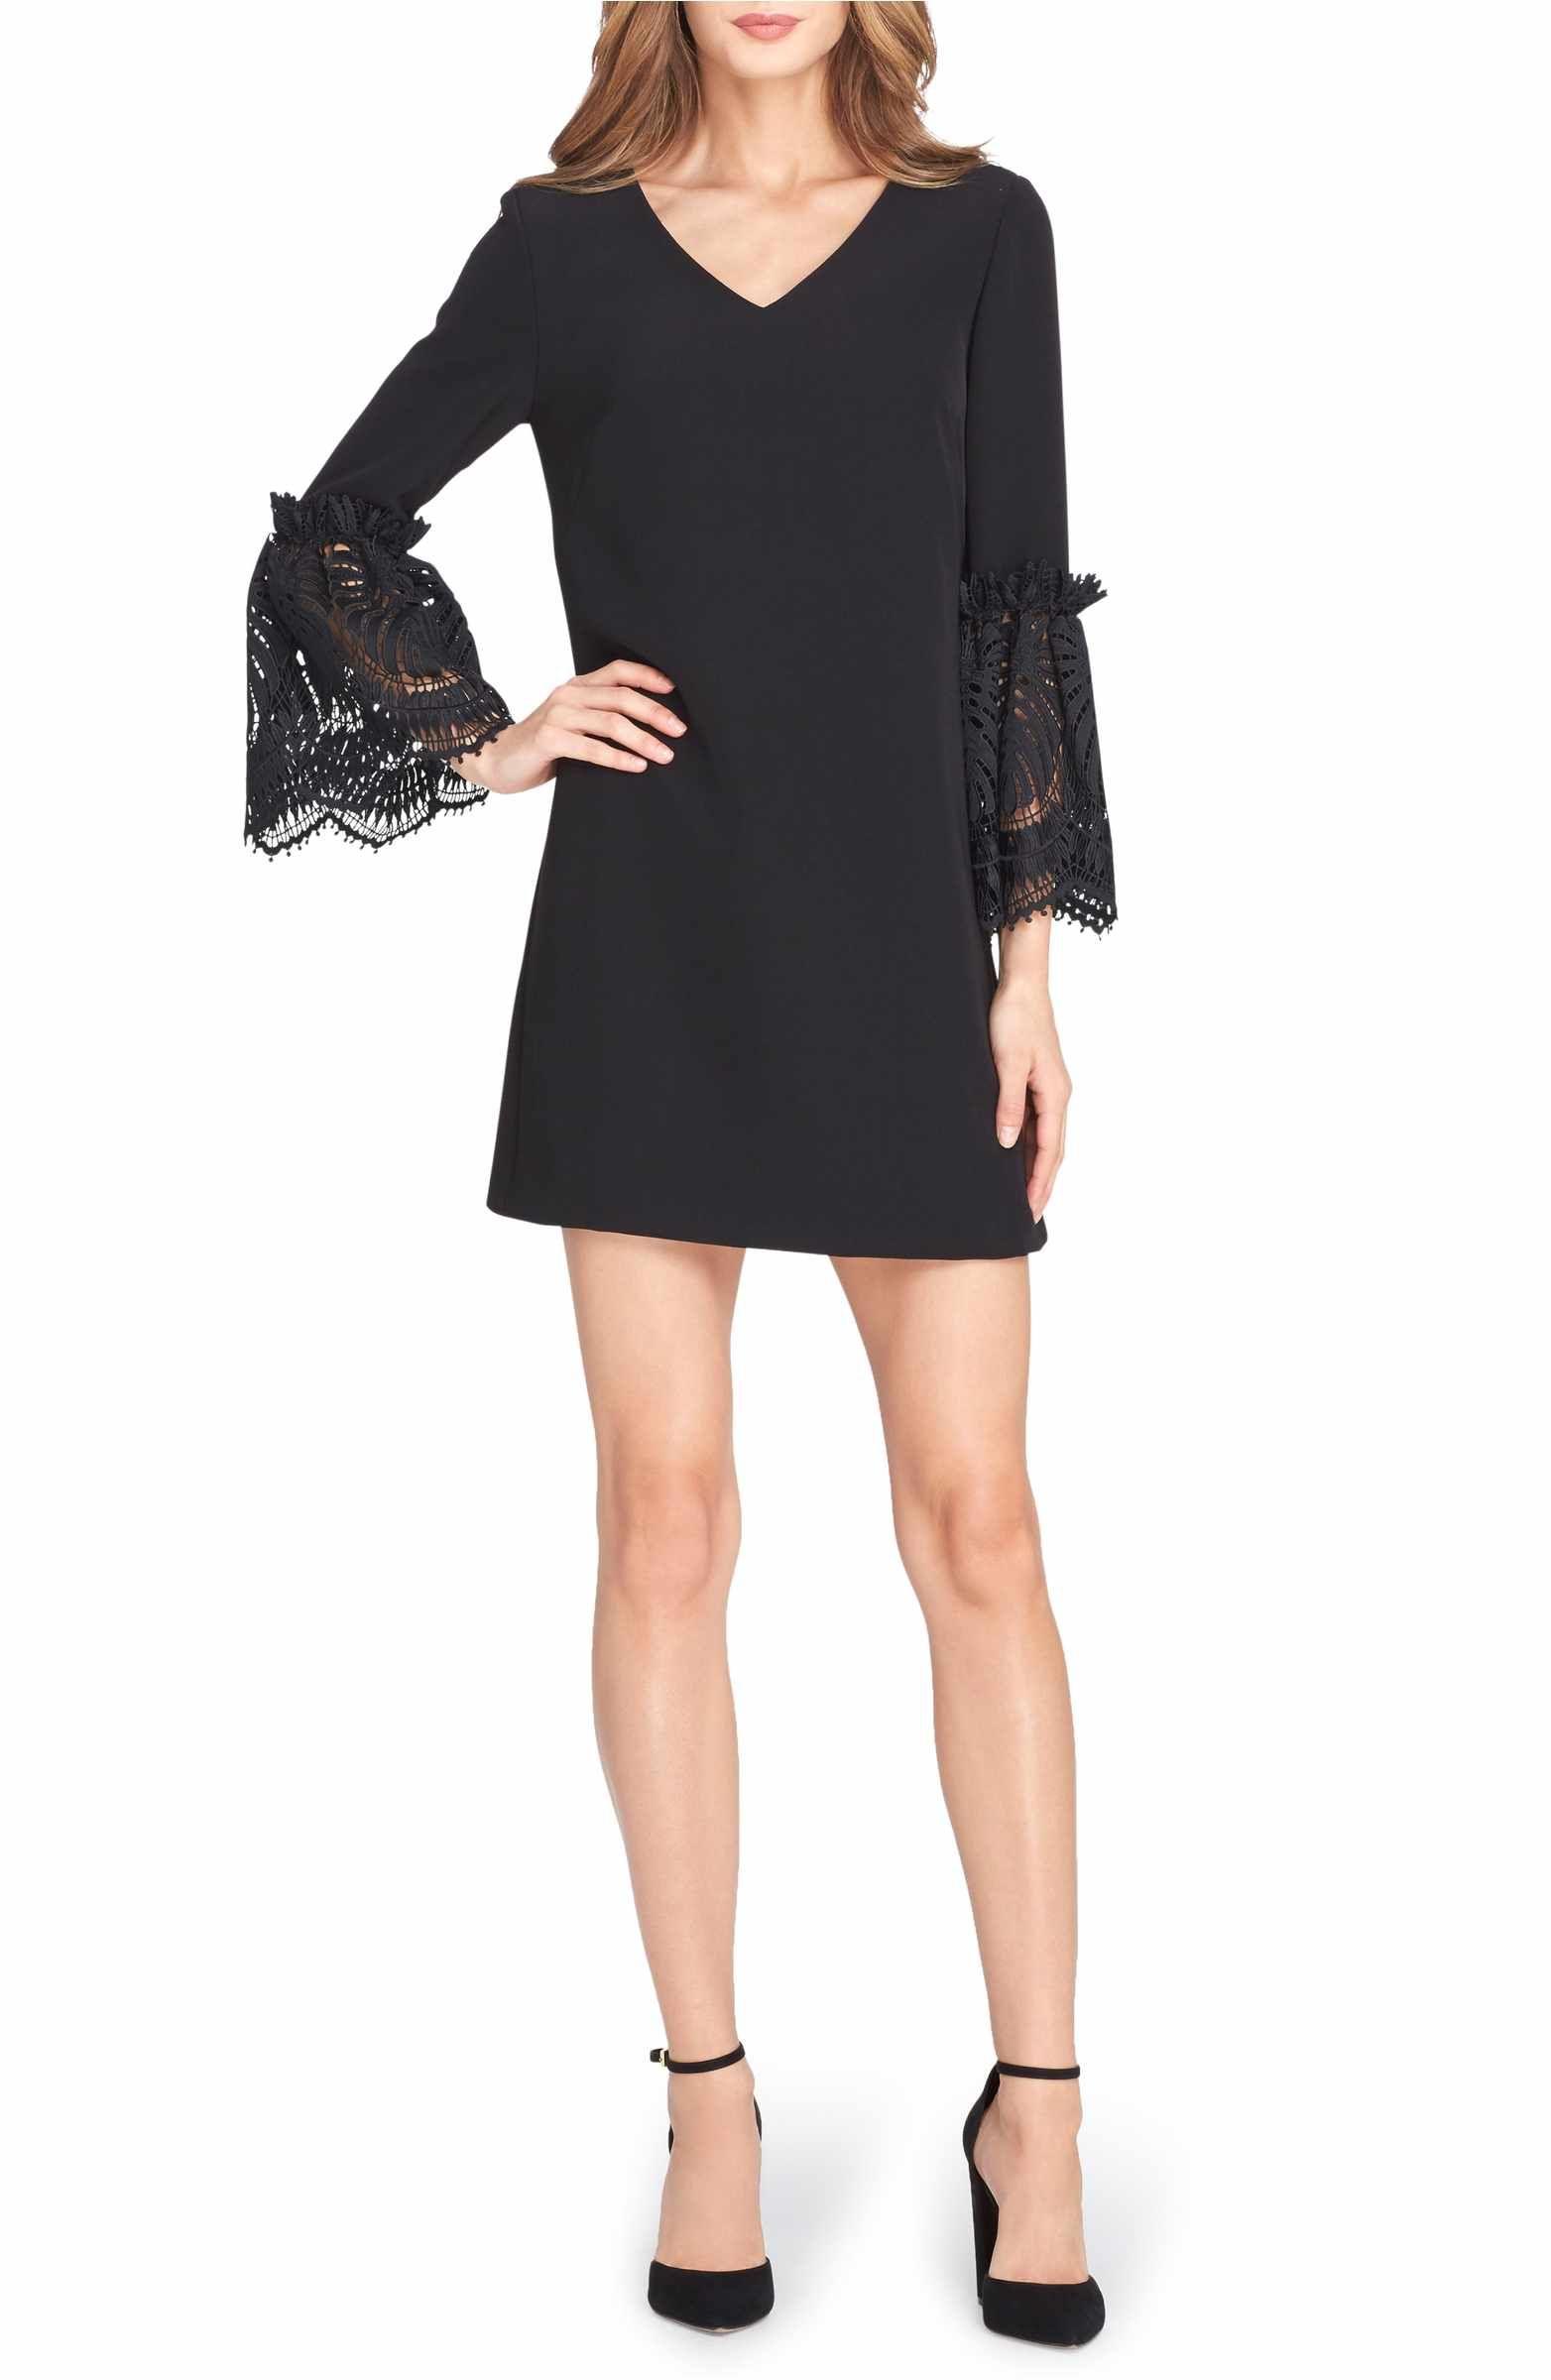 Nordstrom black dresses with sleeves